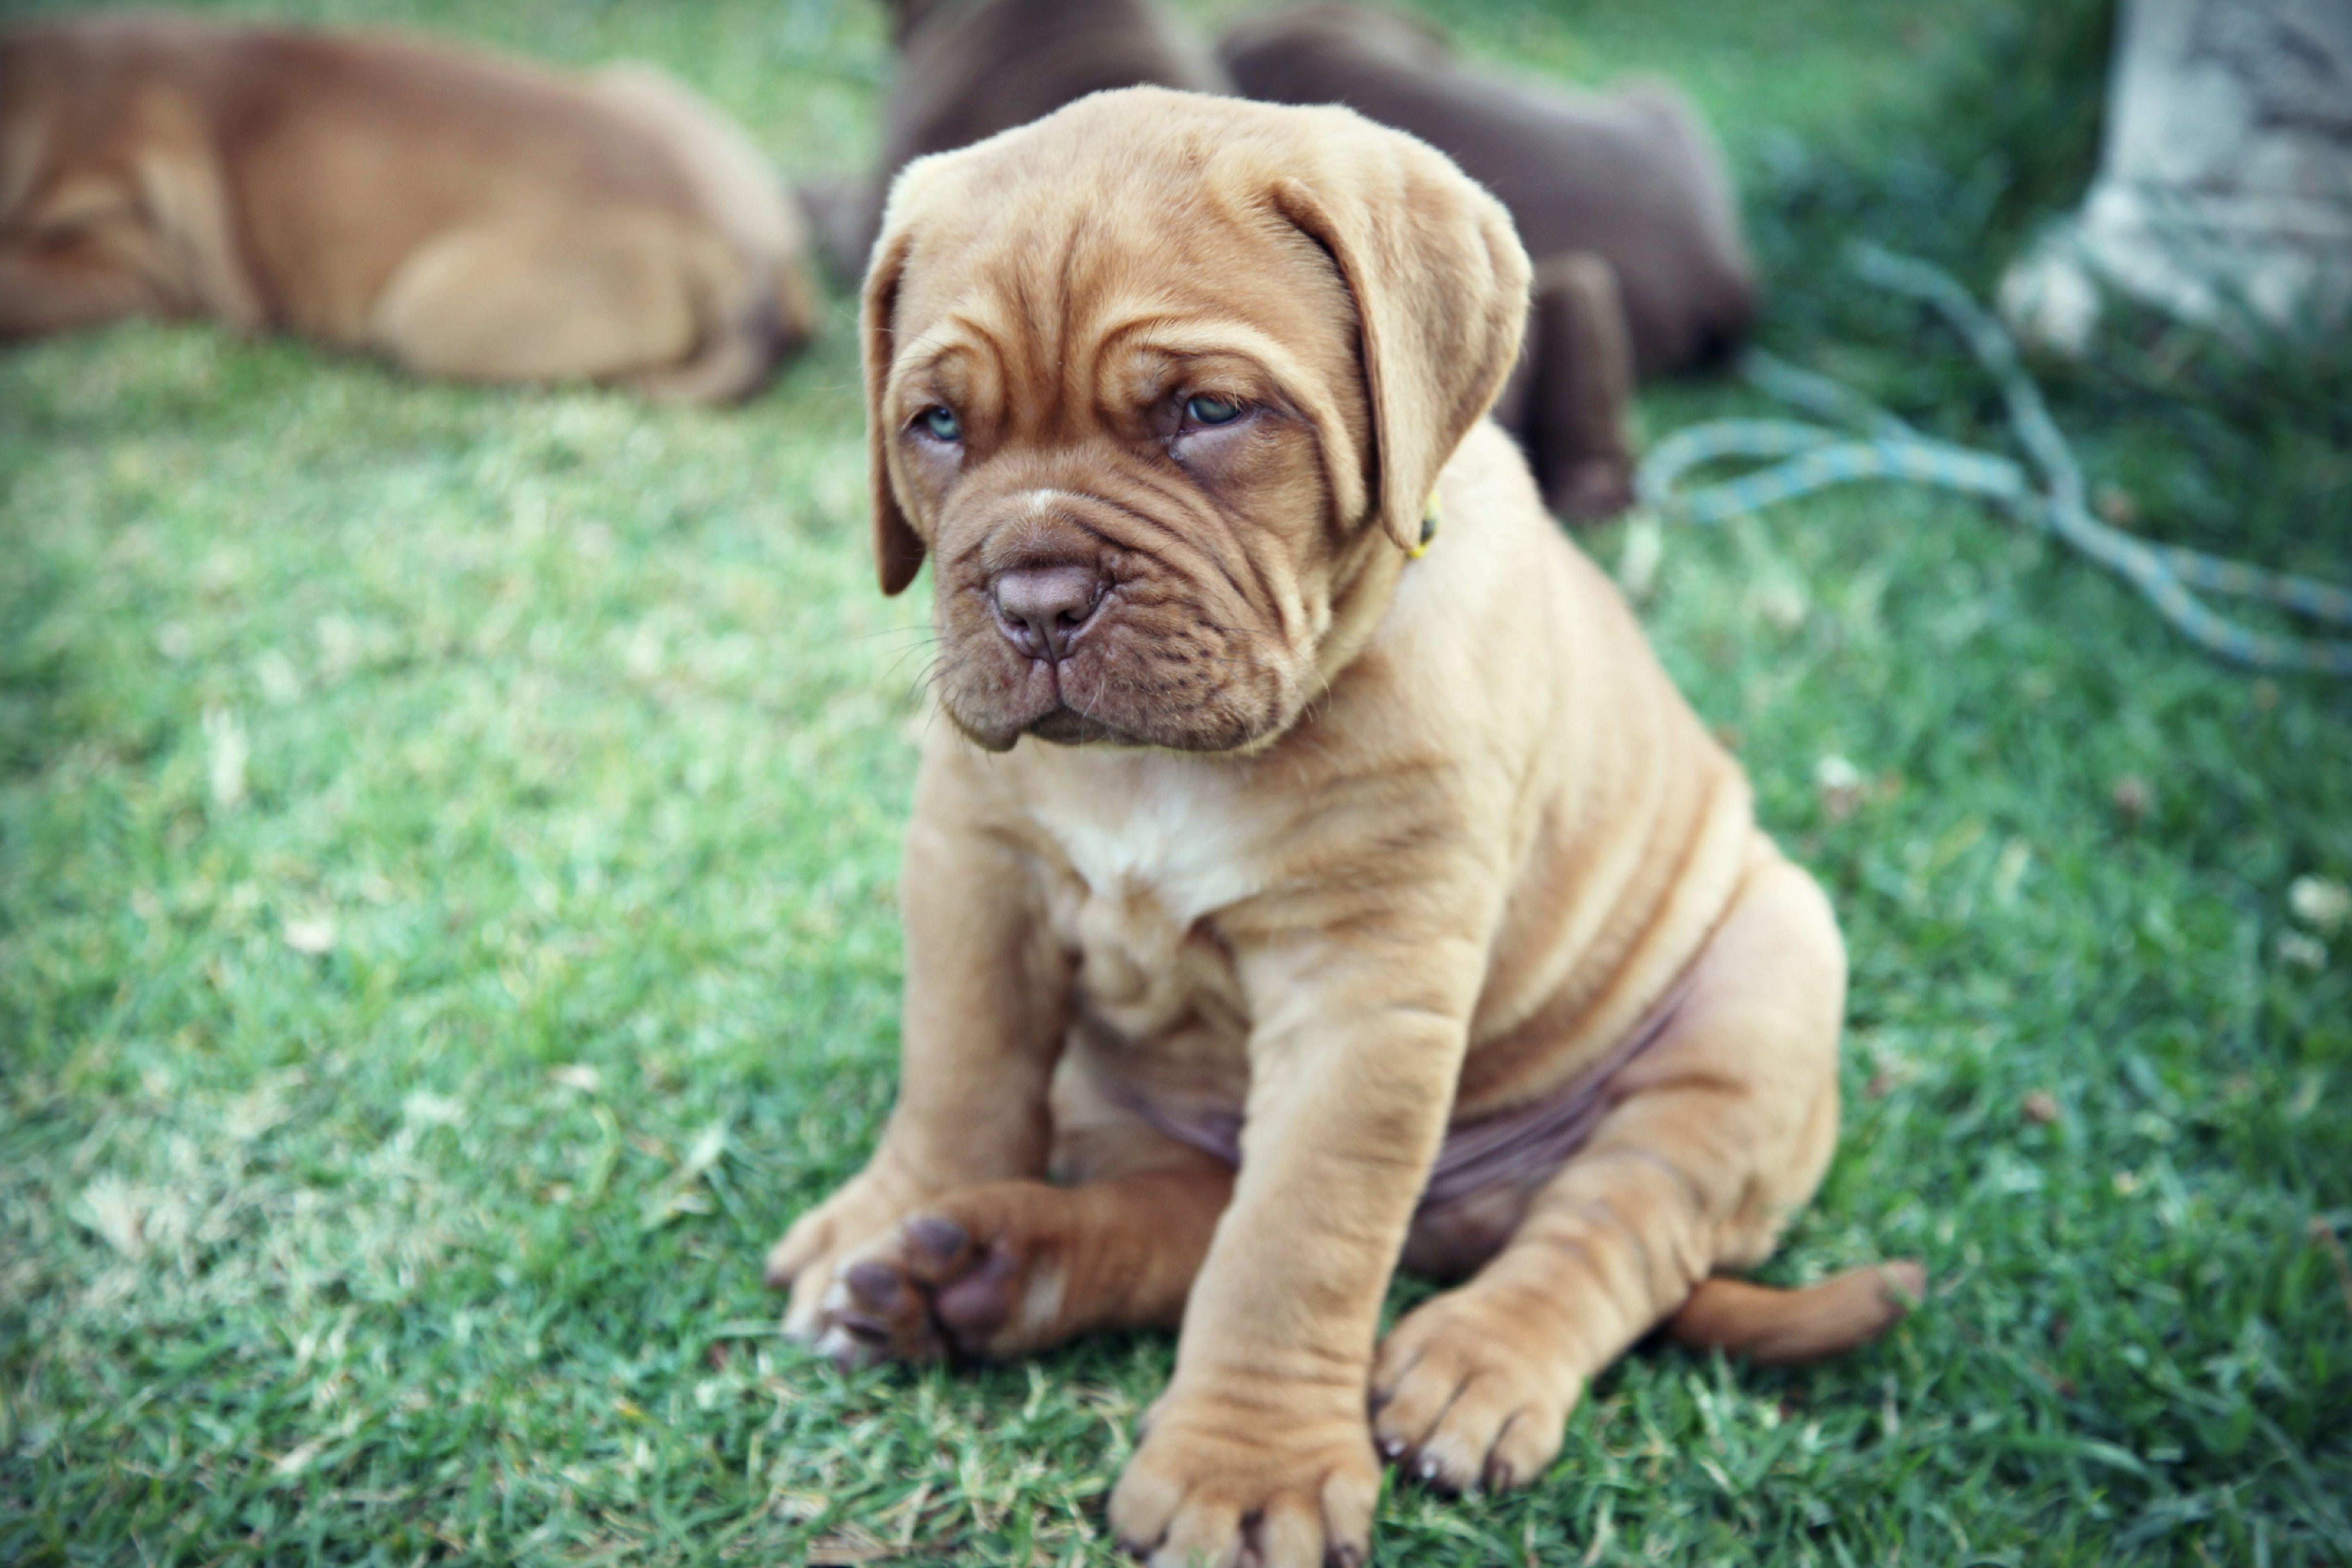 My Dogue De Bordeaux Pup Http Www Facebook Com Ultimatemastiff Bordeaux Dog French Mastiff Best Dog Breeds